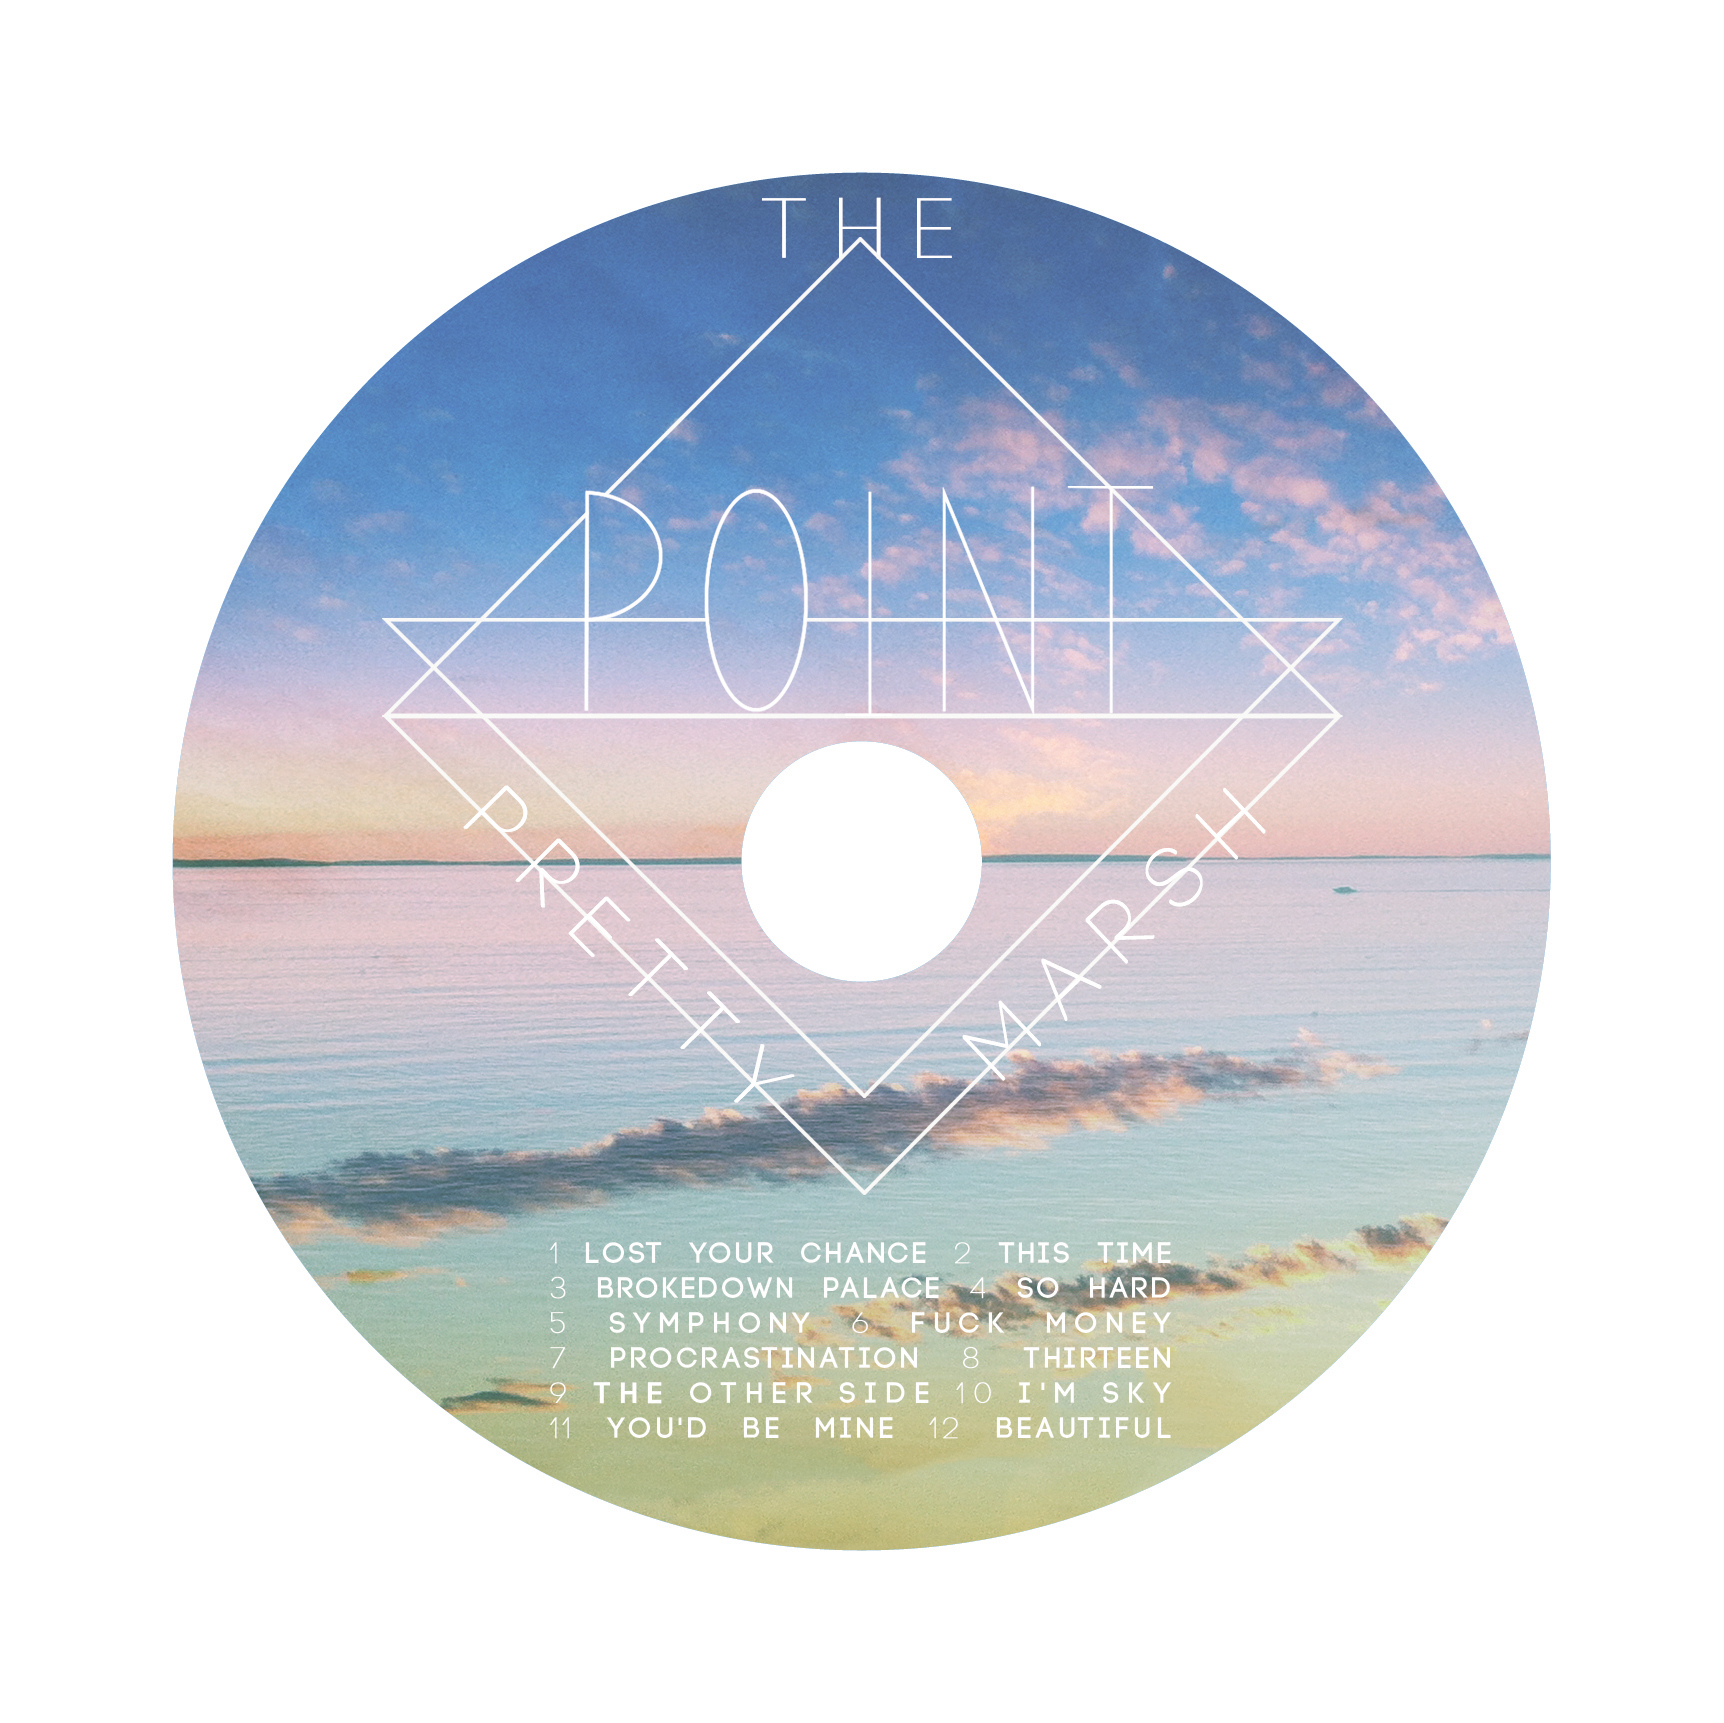 The Point - PRETTY MARSH - CD.jpg